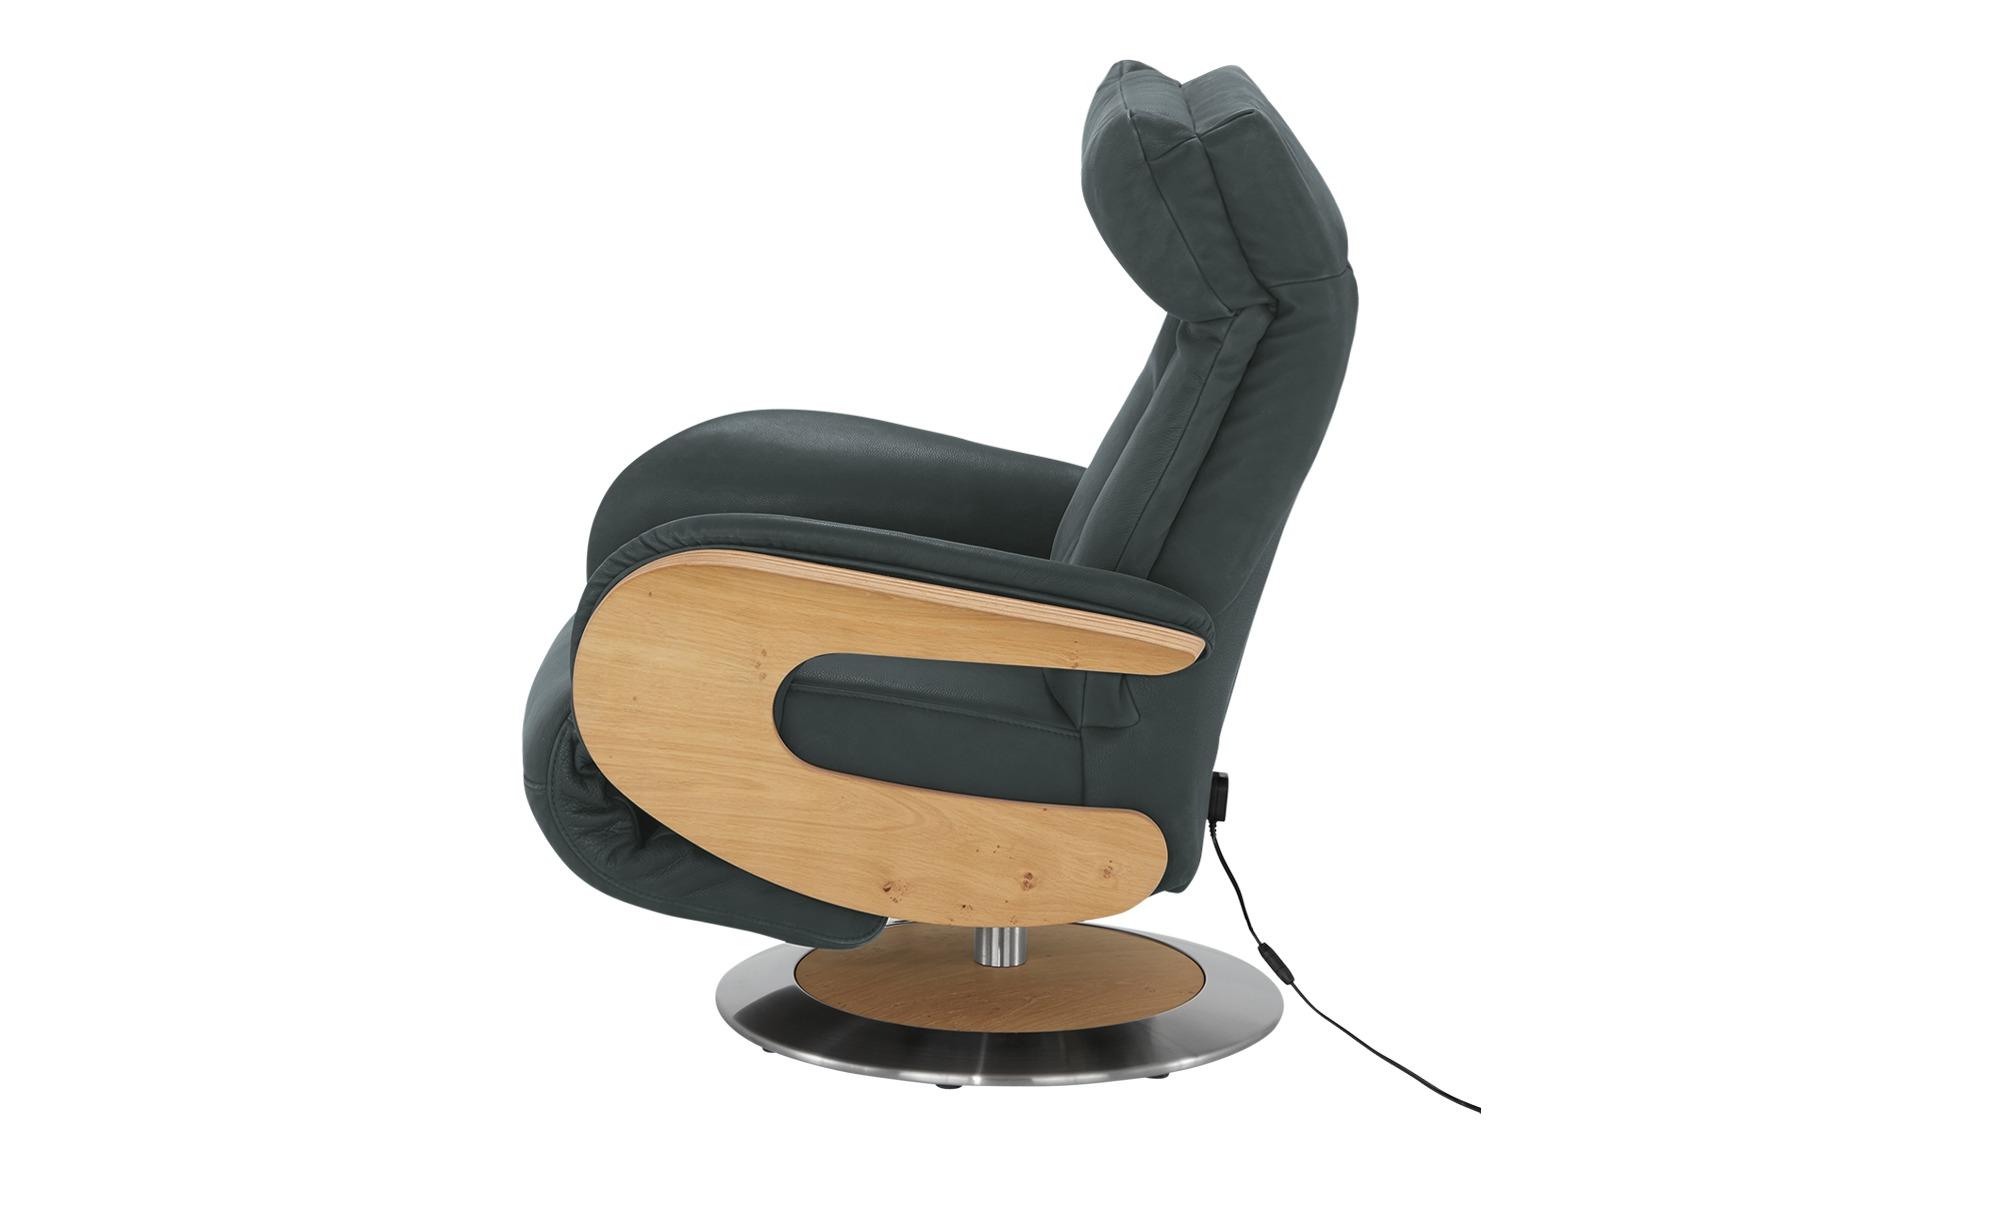 himolla Funktionssessel Leder  7818 ¦ grau ¦ Maße (cm): B: 75 H: 112 T: 87 Polstermöbel > Sessel > Fernsehsessel - Höffner